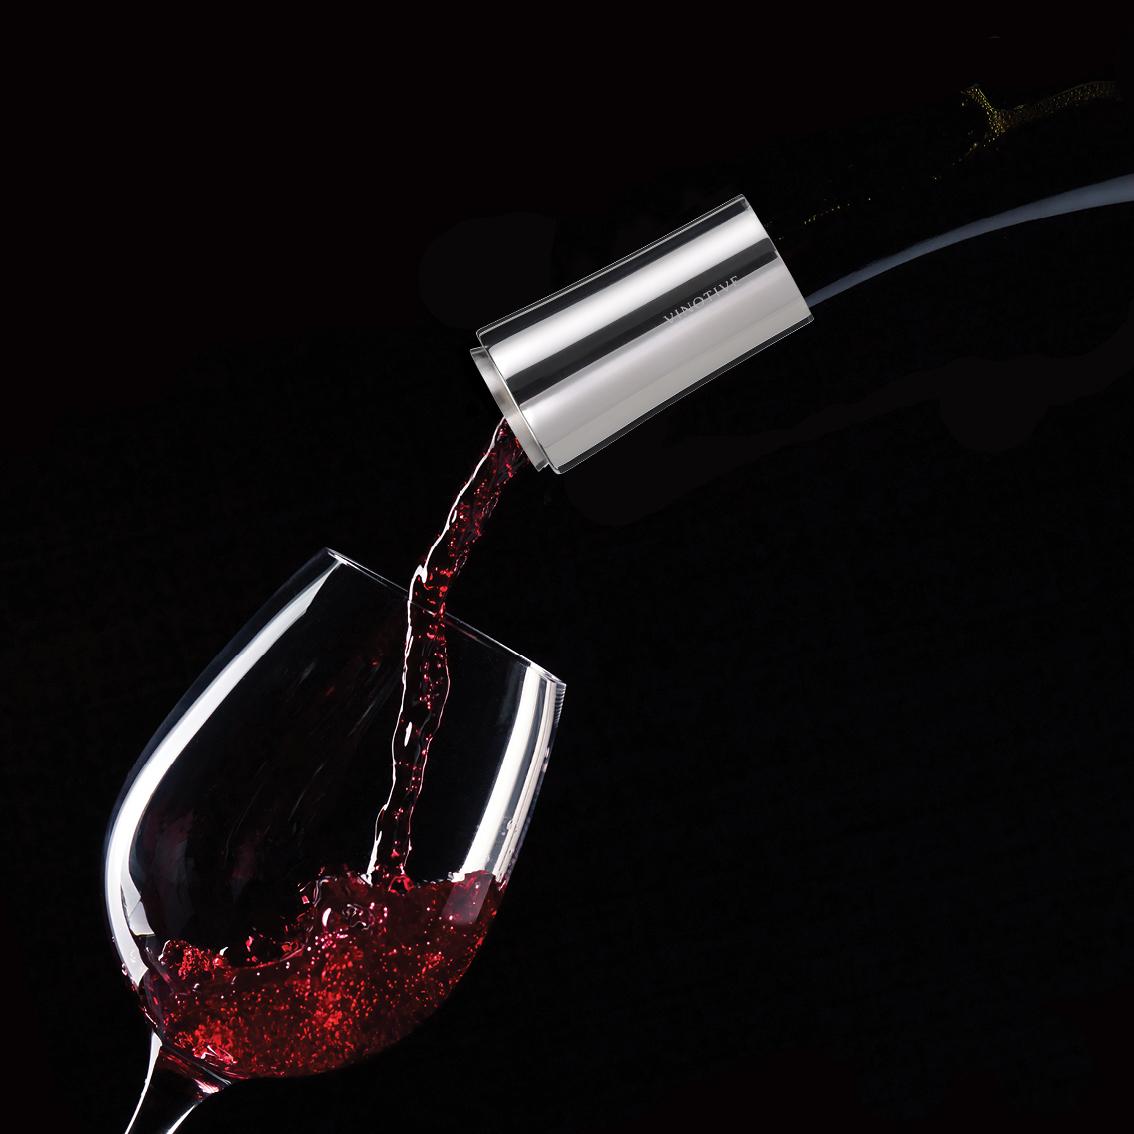 Vinaer No Drip Pouring